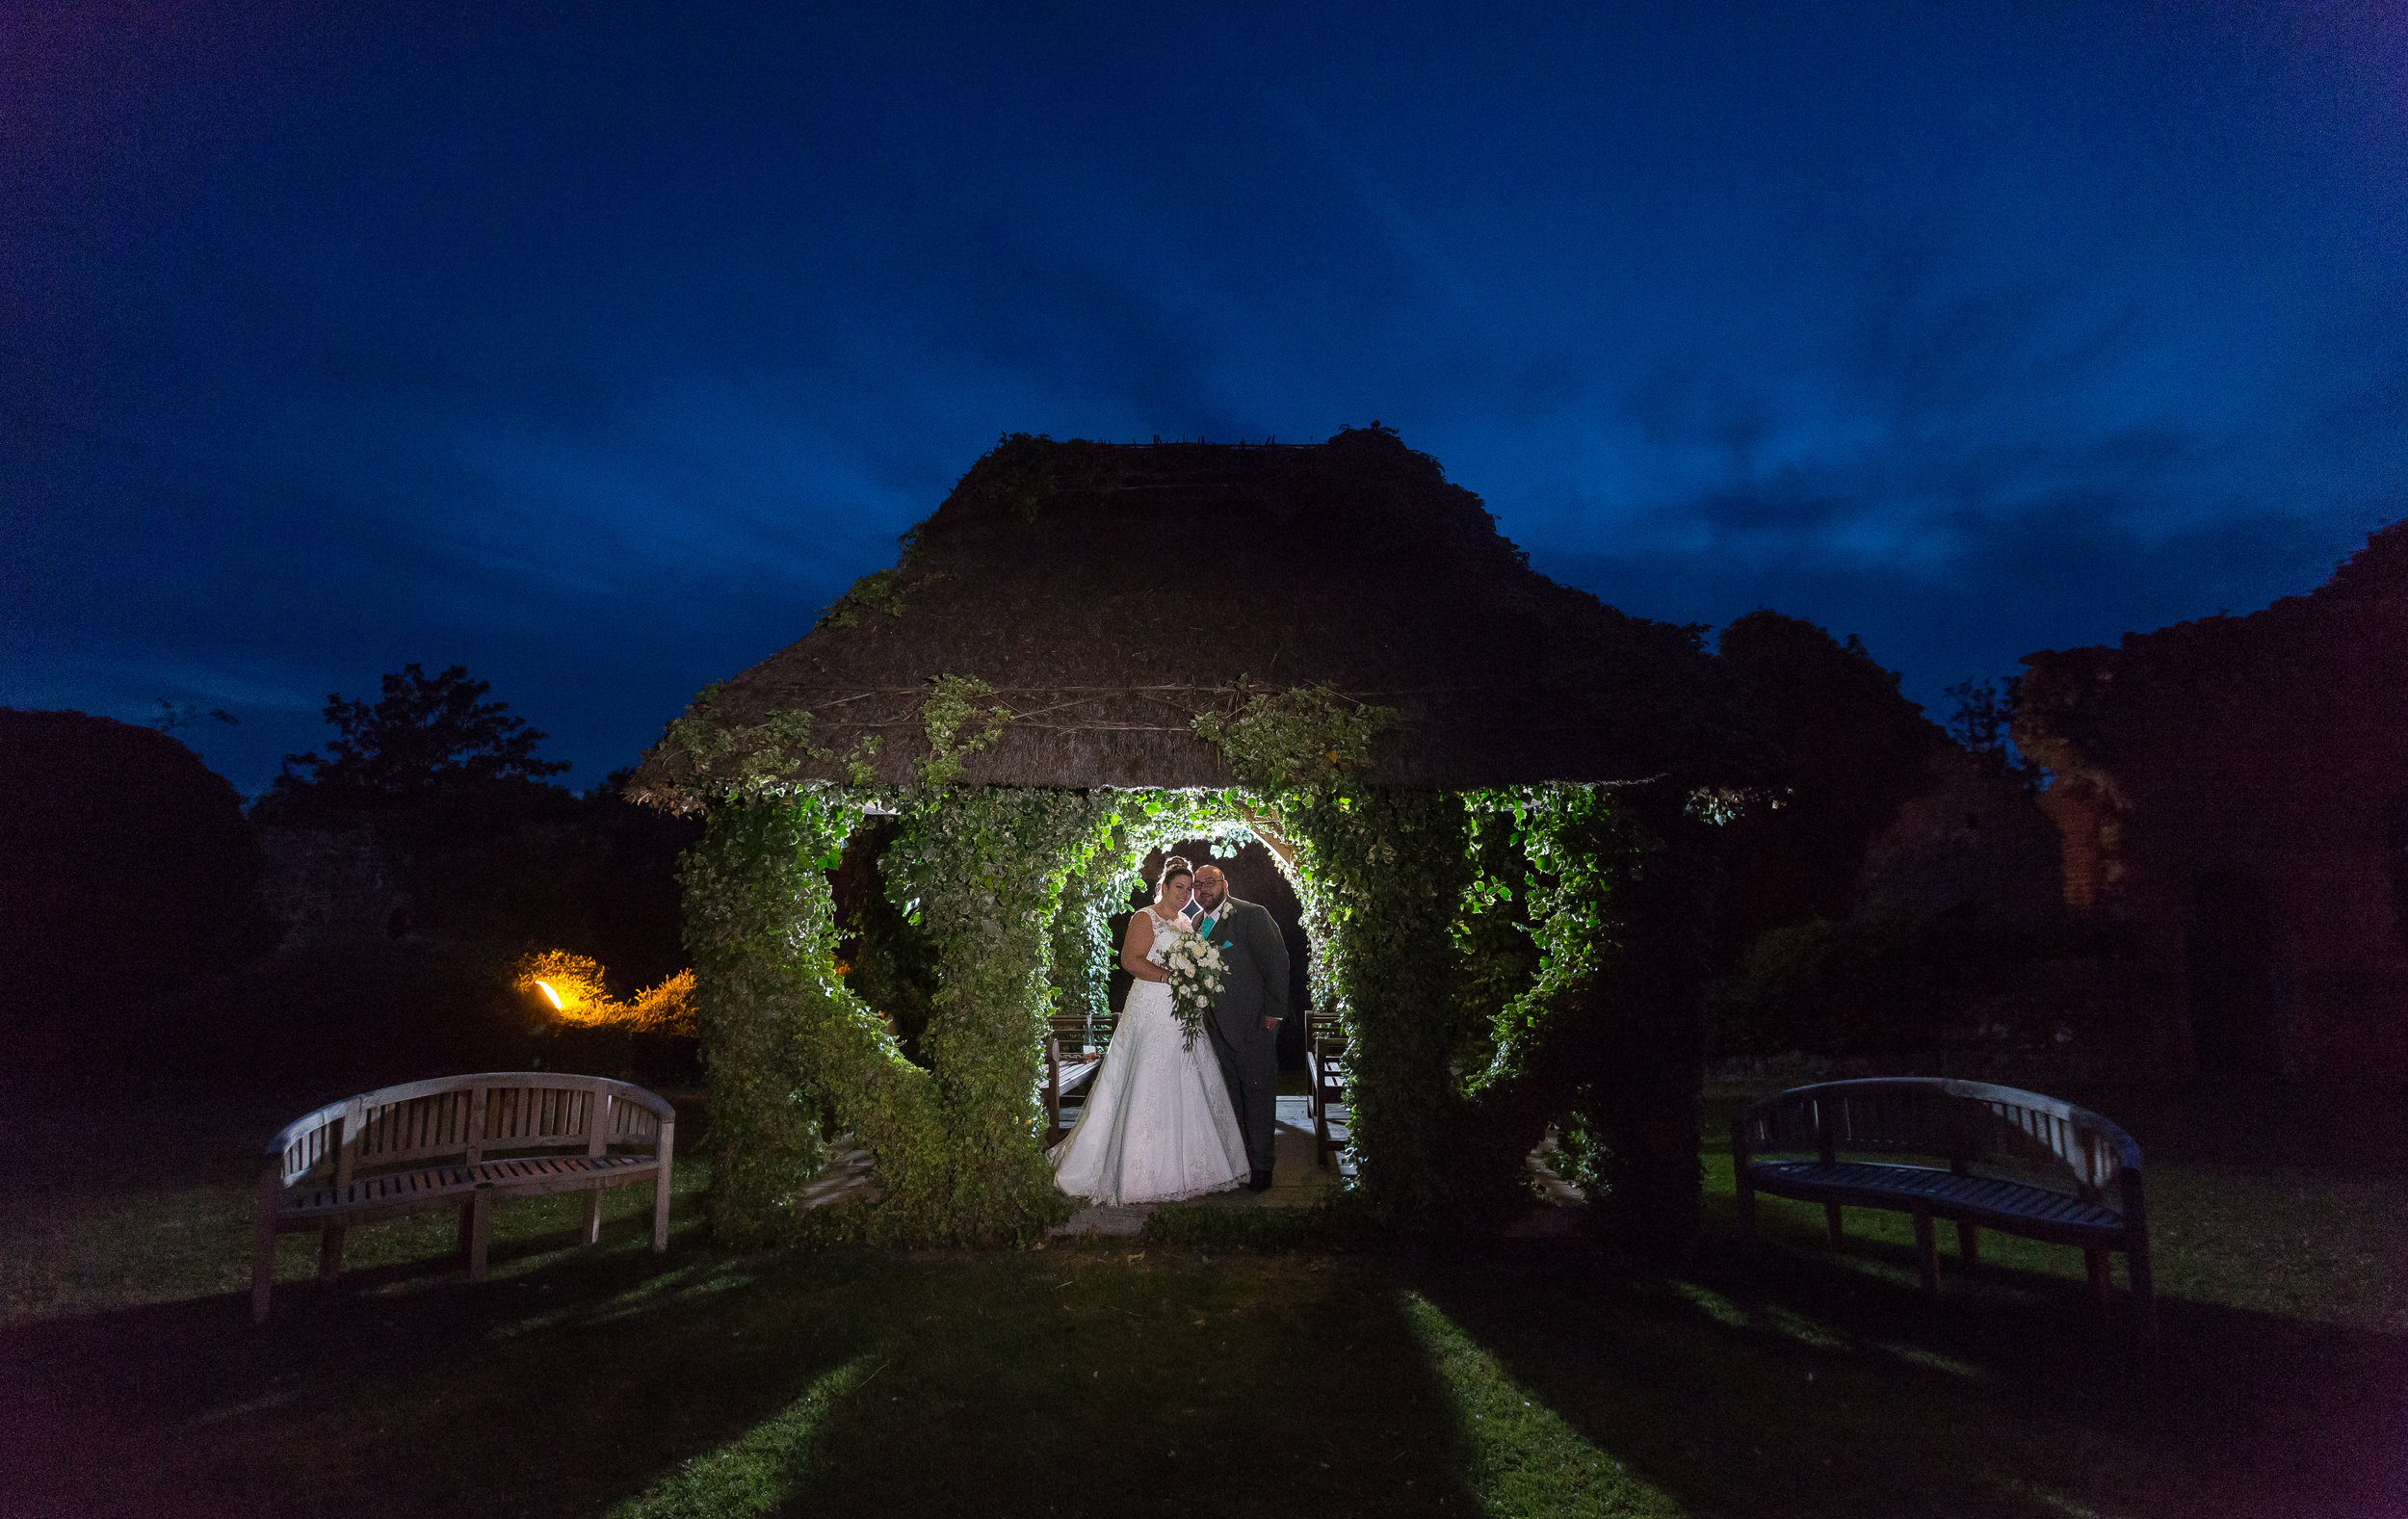 westenhangar-castle-kent-london-wedding-photography-portrait-01